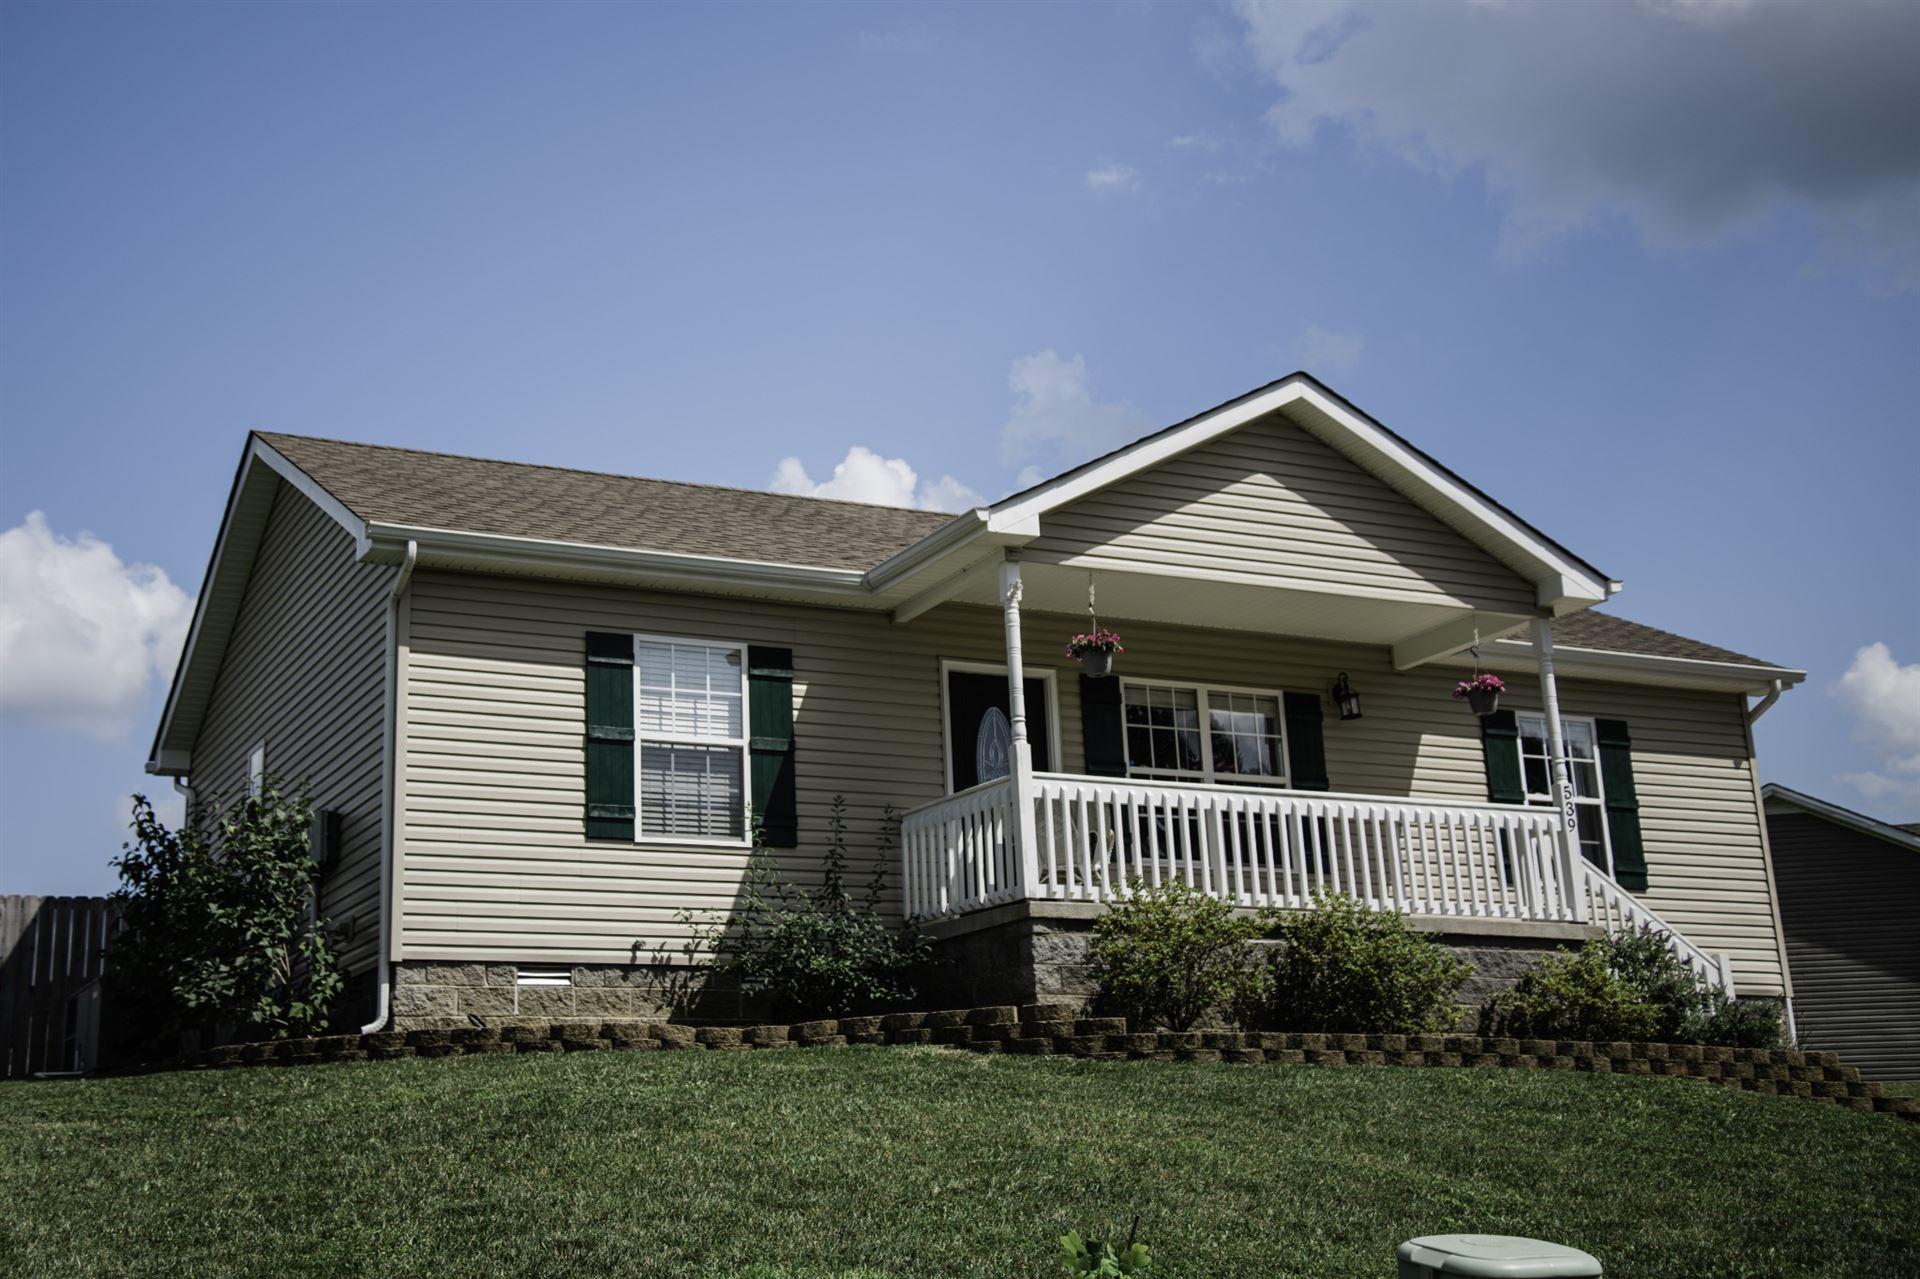 539 Cedar Valley Dr, Clarksville, TN 37043 - MLS#: 2293806